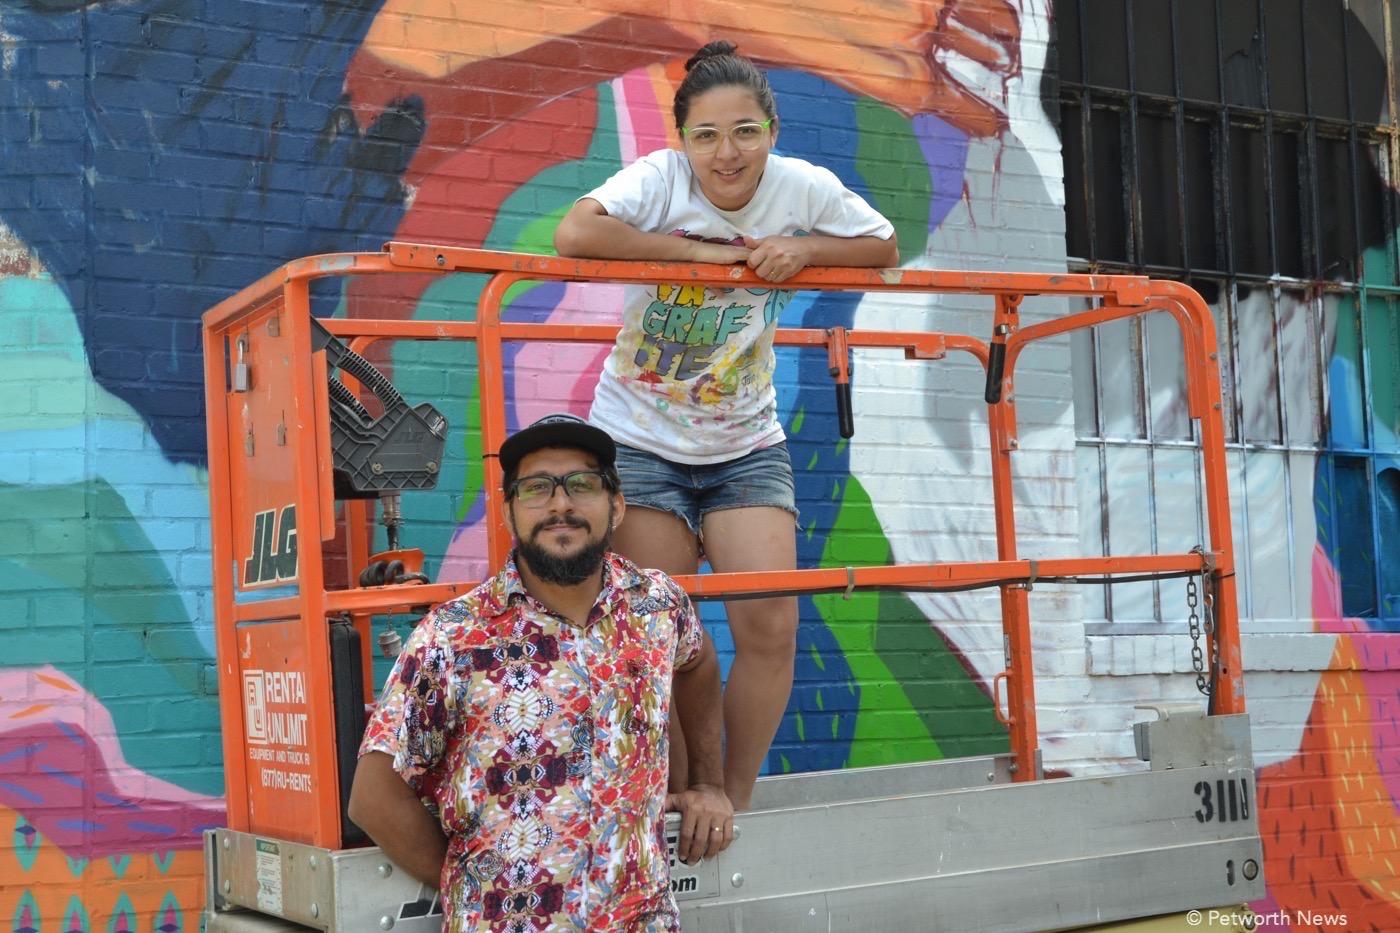 Artists Robezio Marqs and Tereza Dequinta